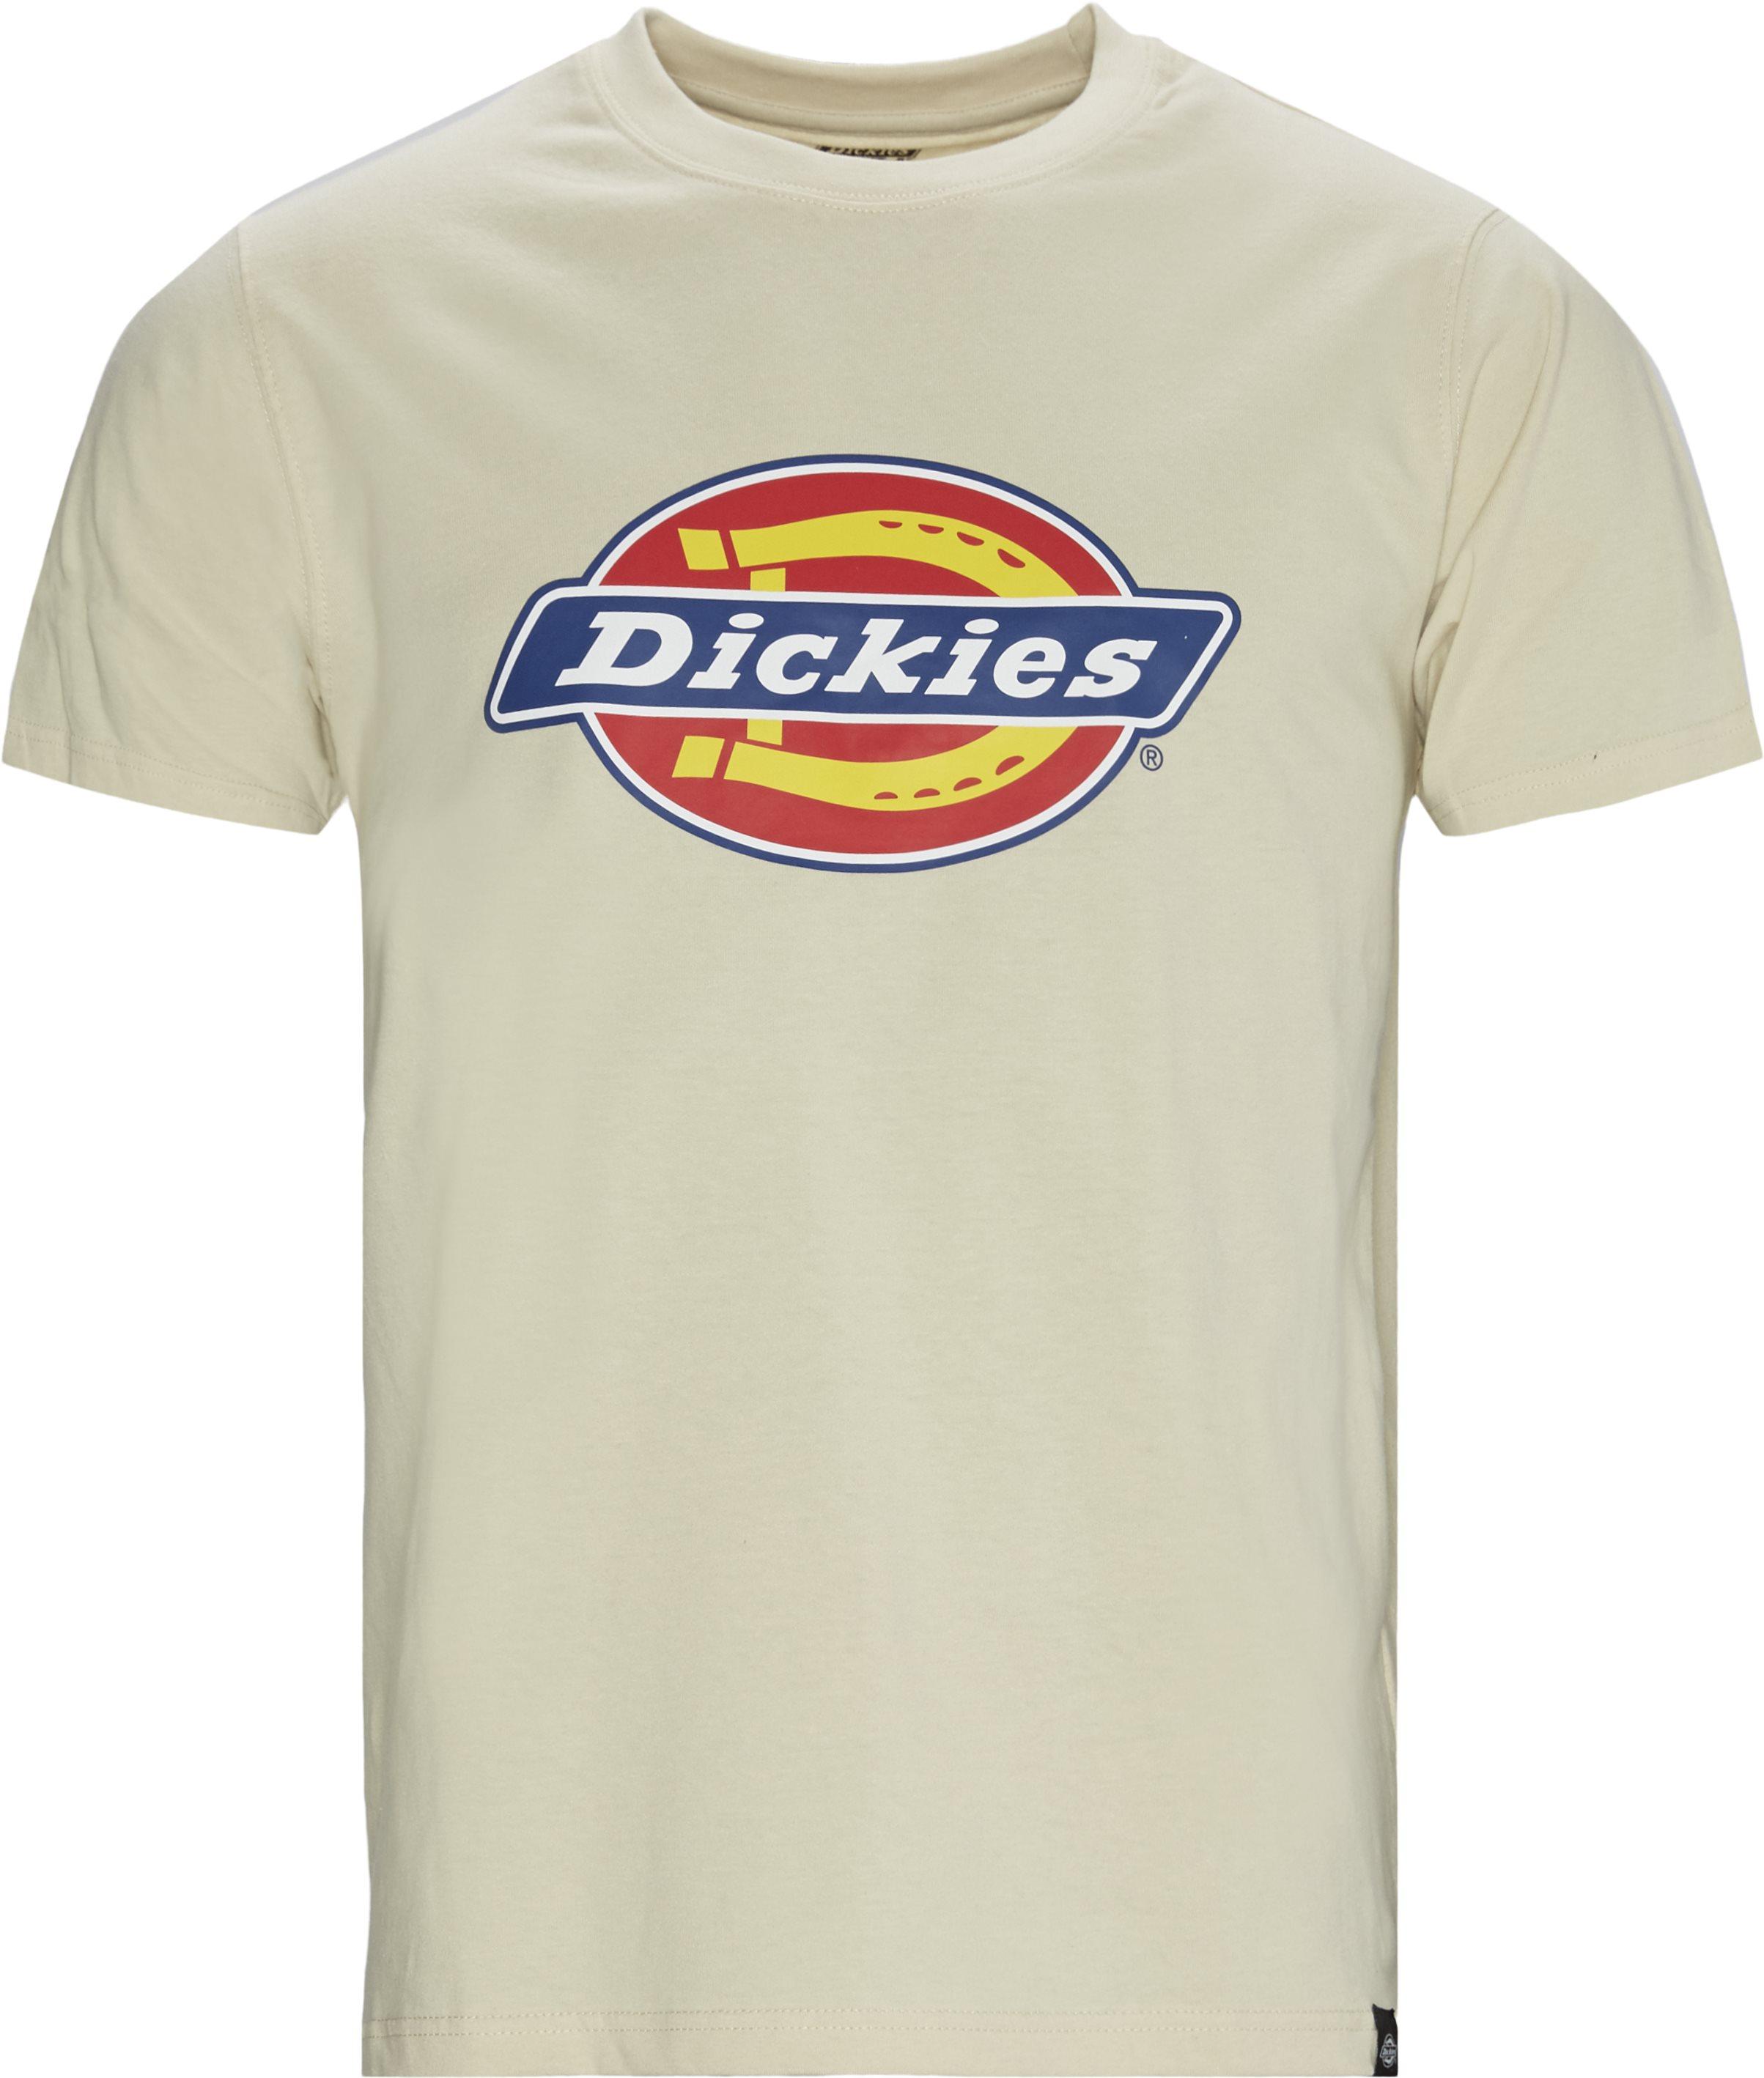 Horseshoe Tee - T-shirts - Regular fit - Sand